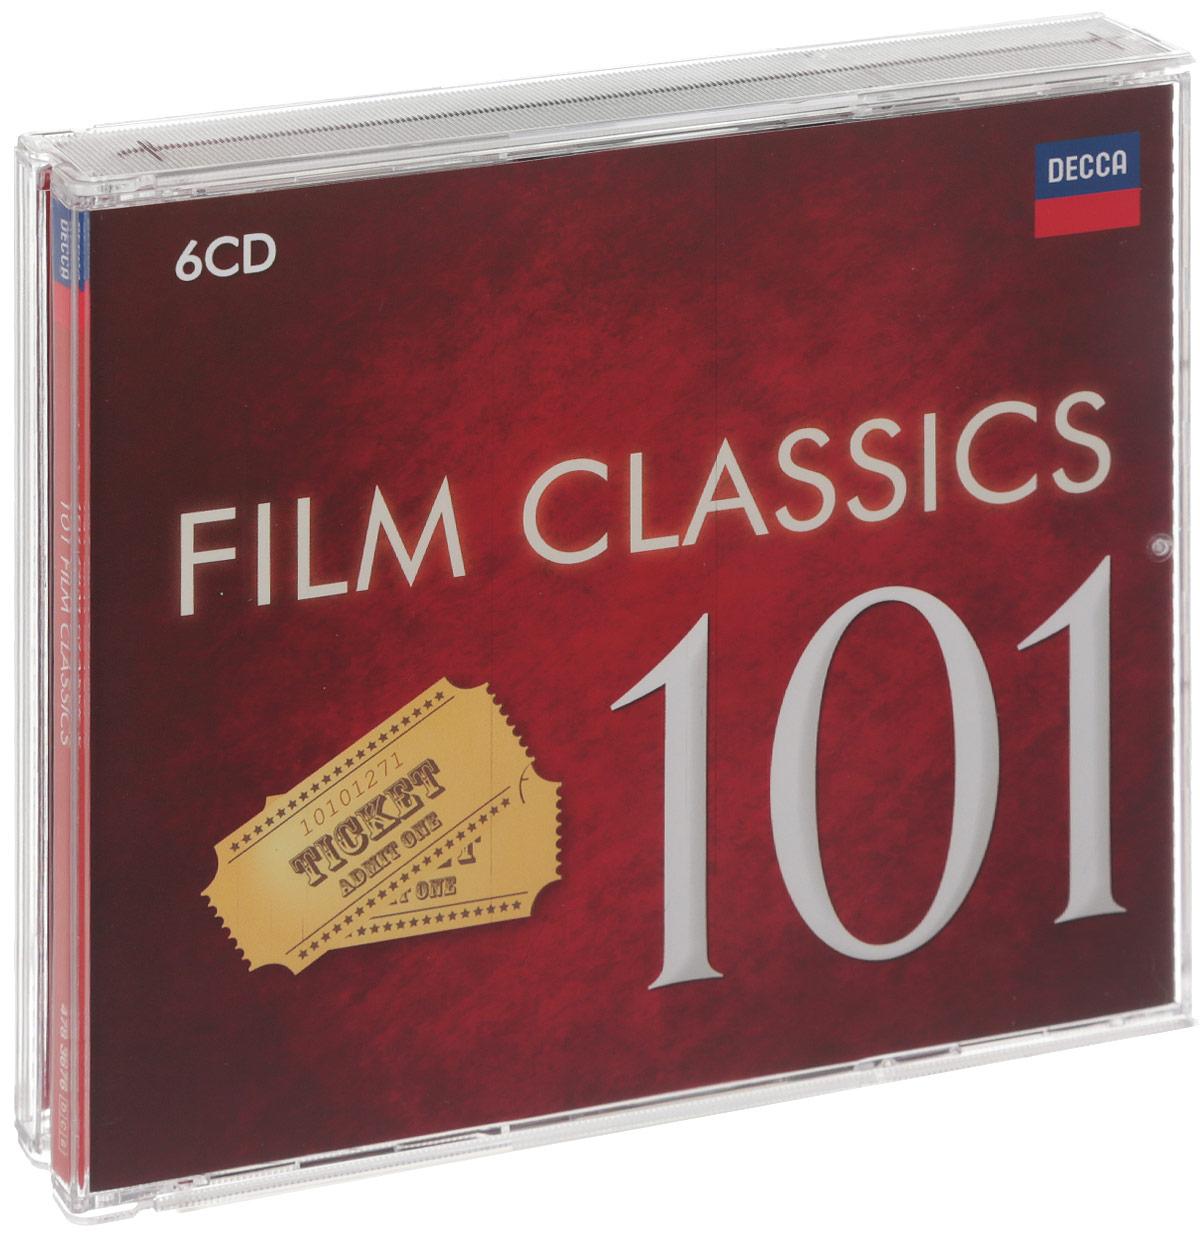 101 Film Classics (6 CD) 101 vivaldi 6 cd